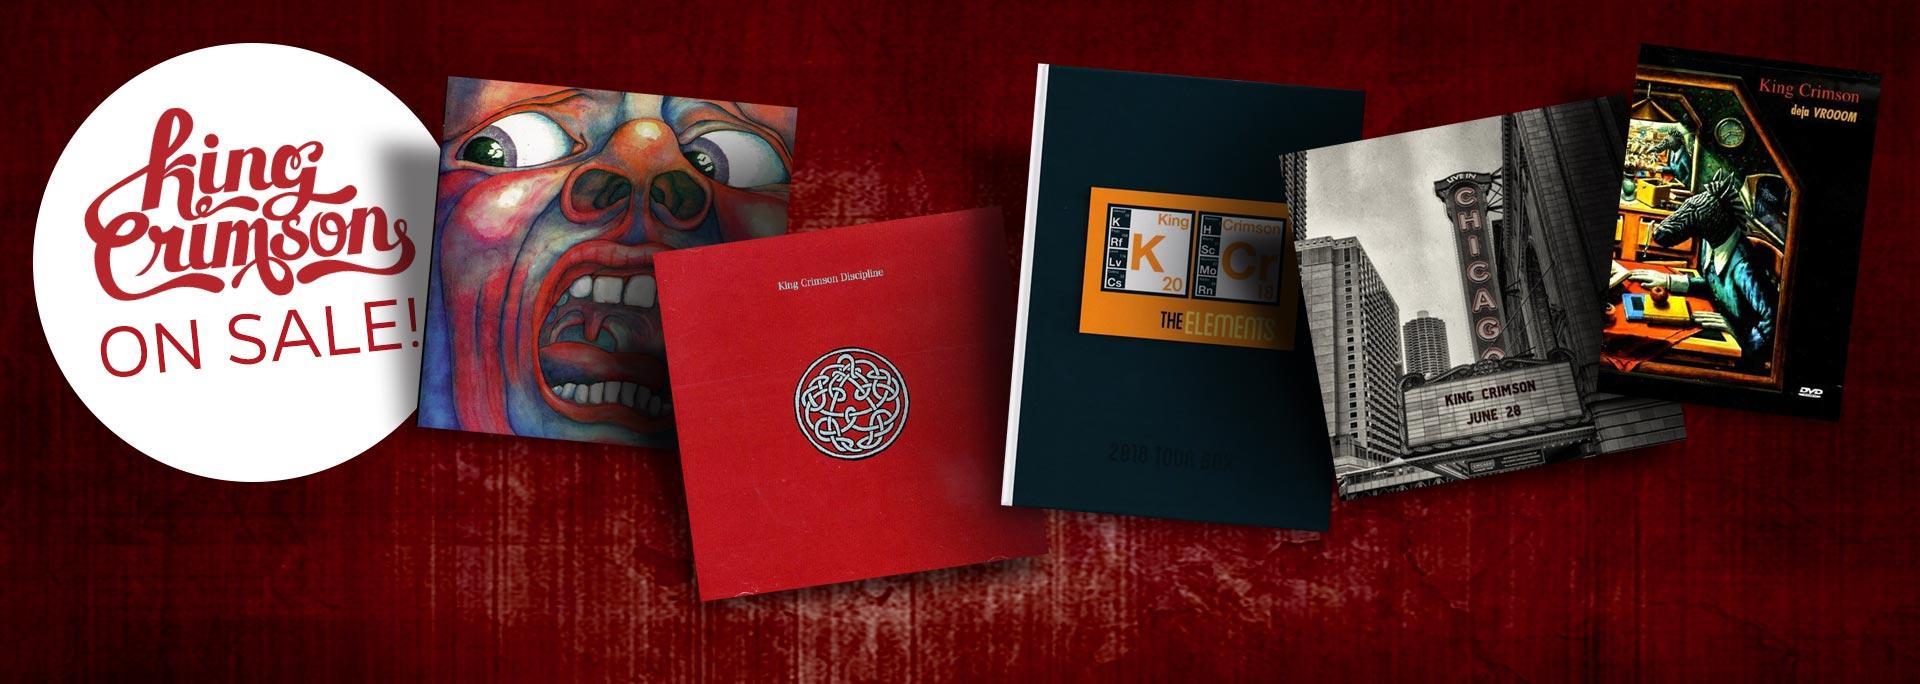 King Crimson On Sale